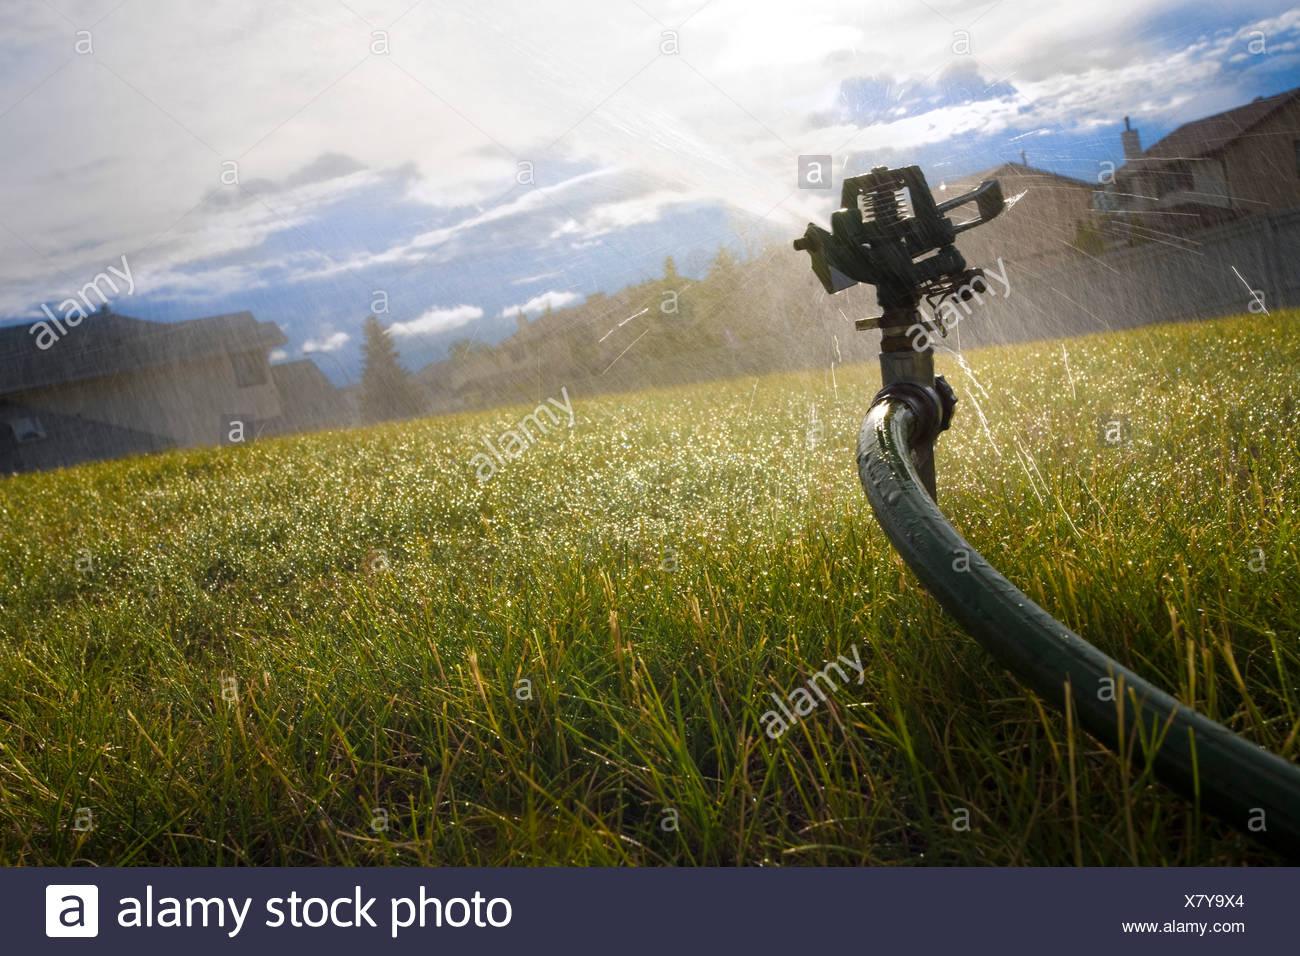 Sprinkler watering the lawn - Stock Image